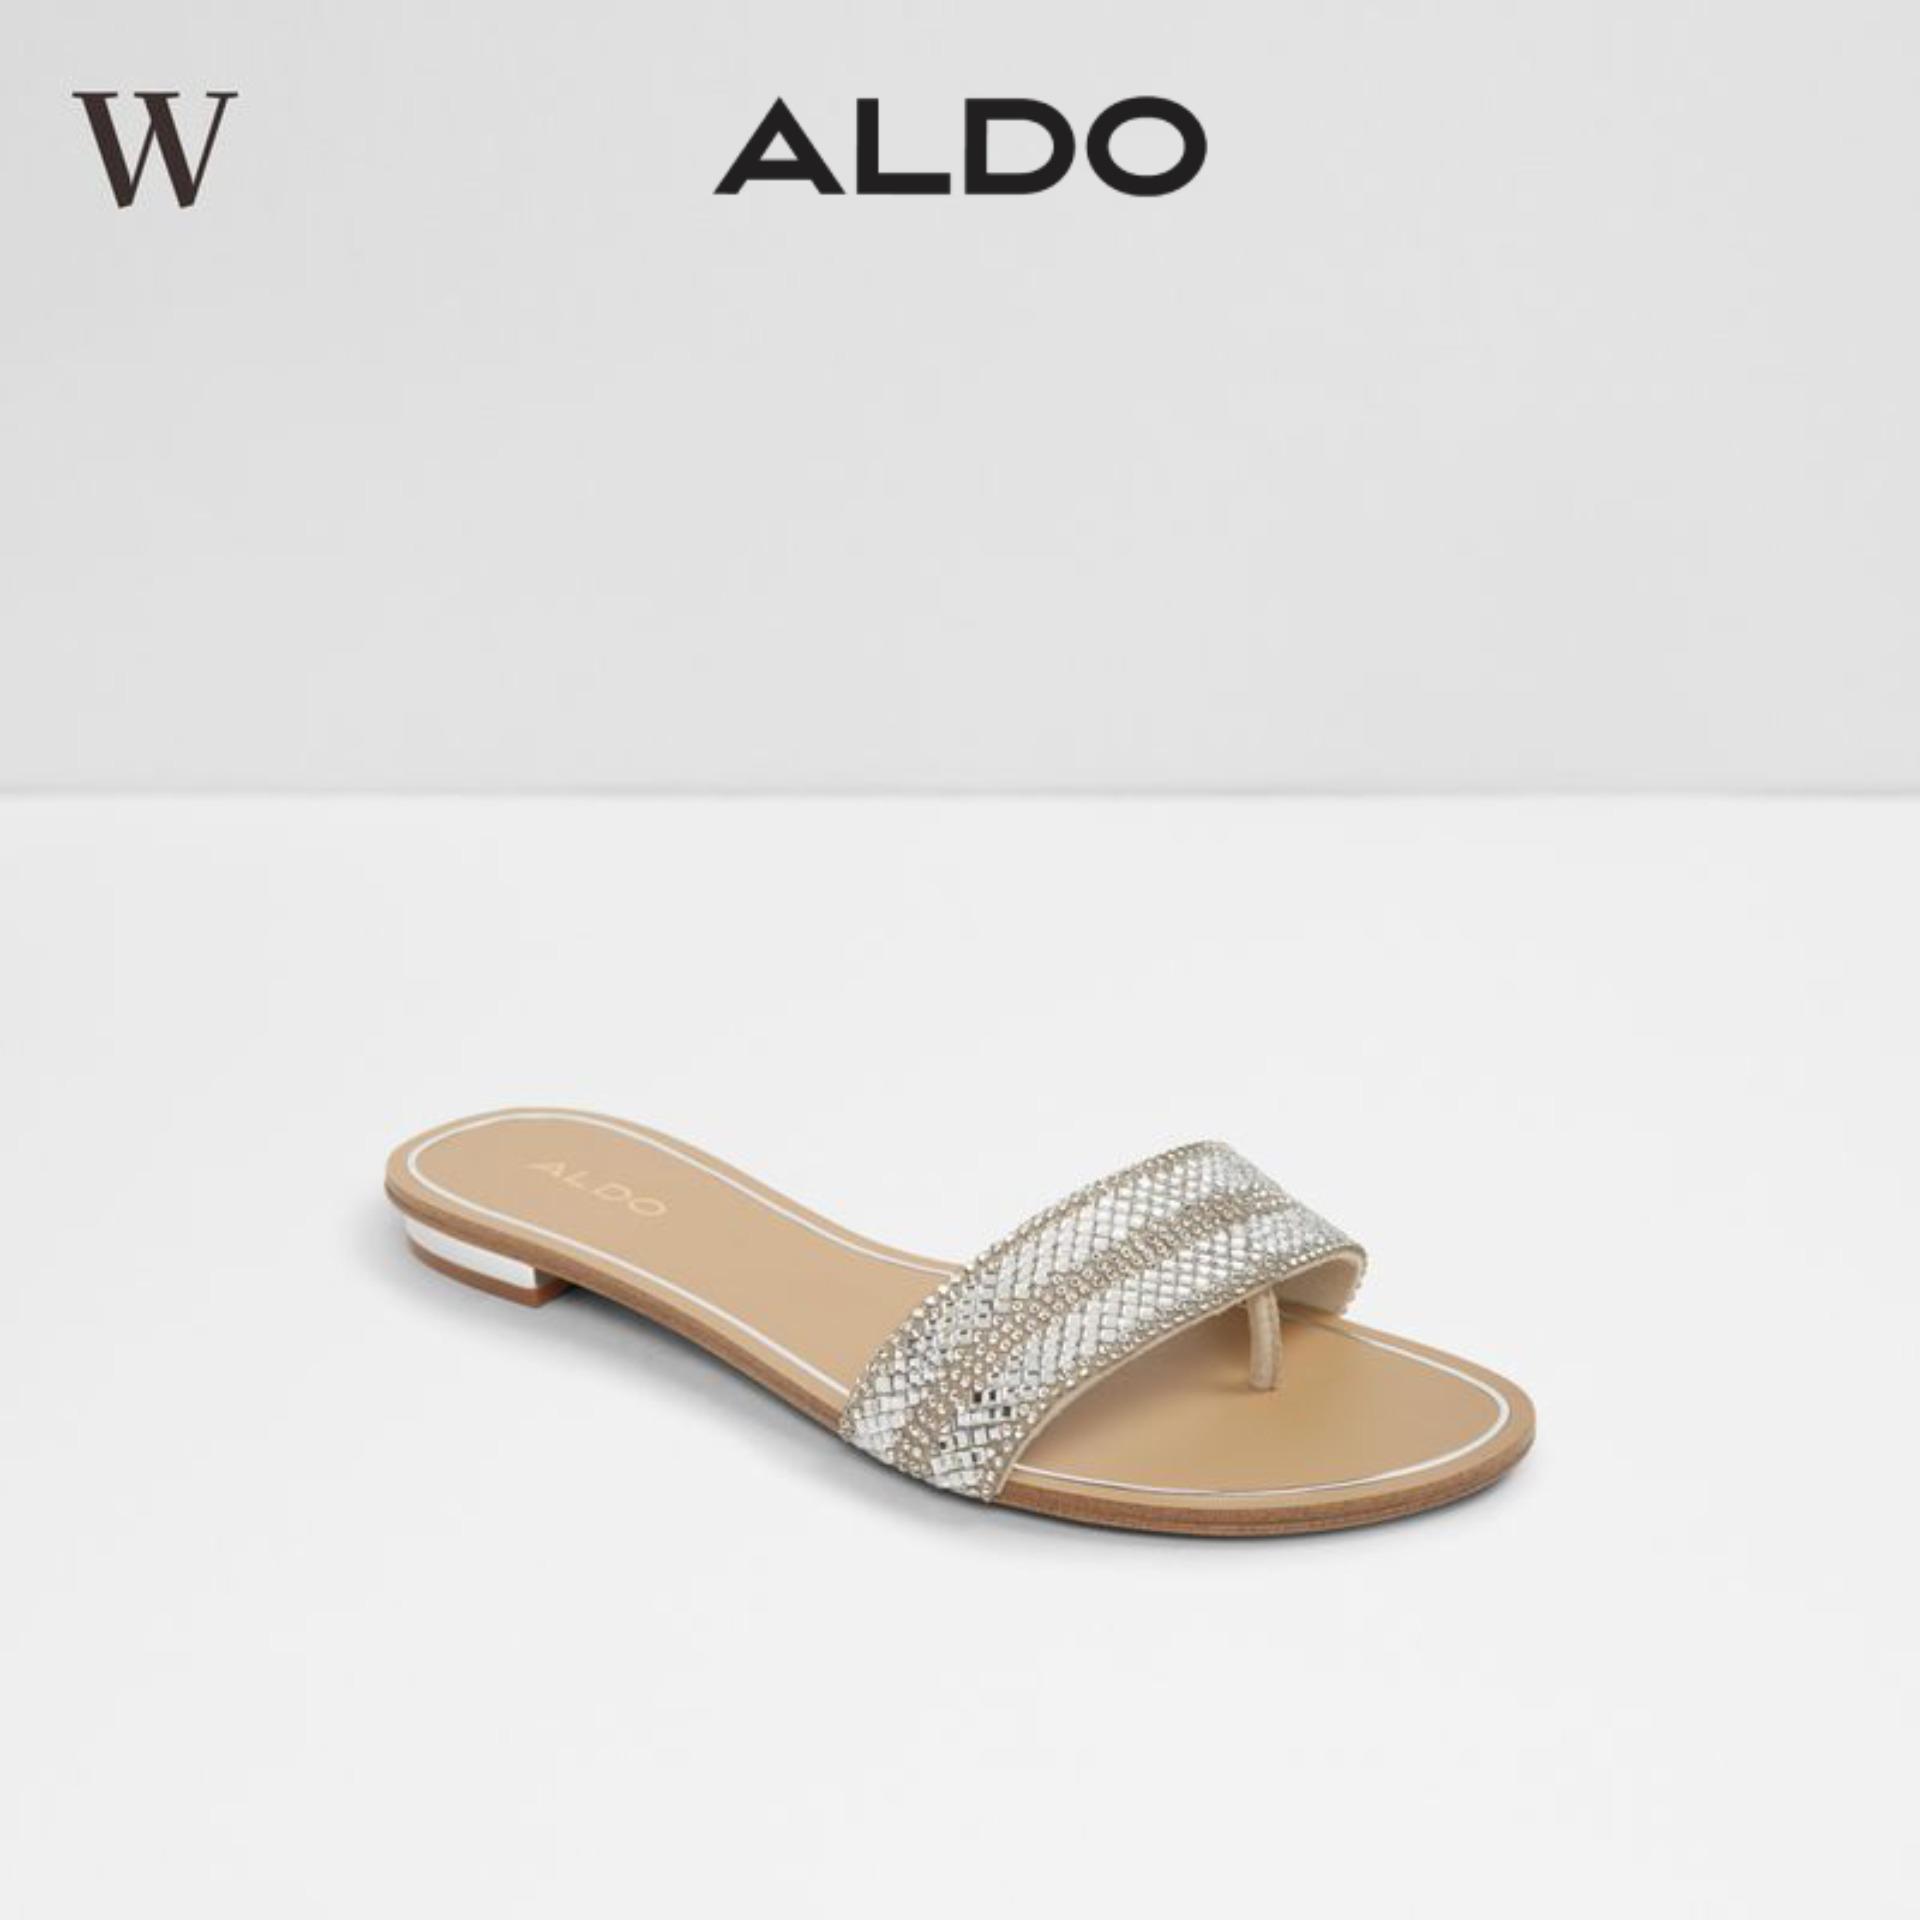 [sale] Aldo Cadilinnaw Woman Fashionable Slip On Short Block Heel Sandals Metallic Miscellaneous / Pewter.